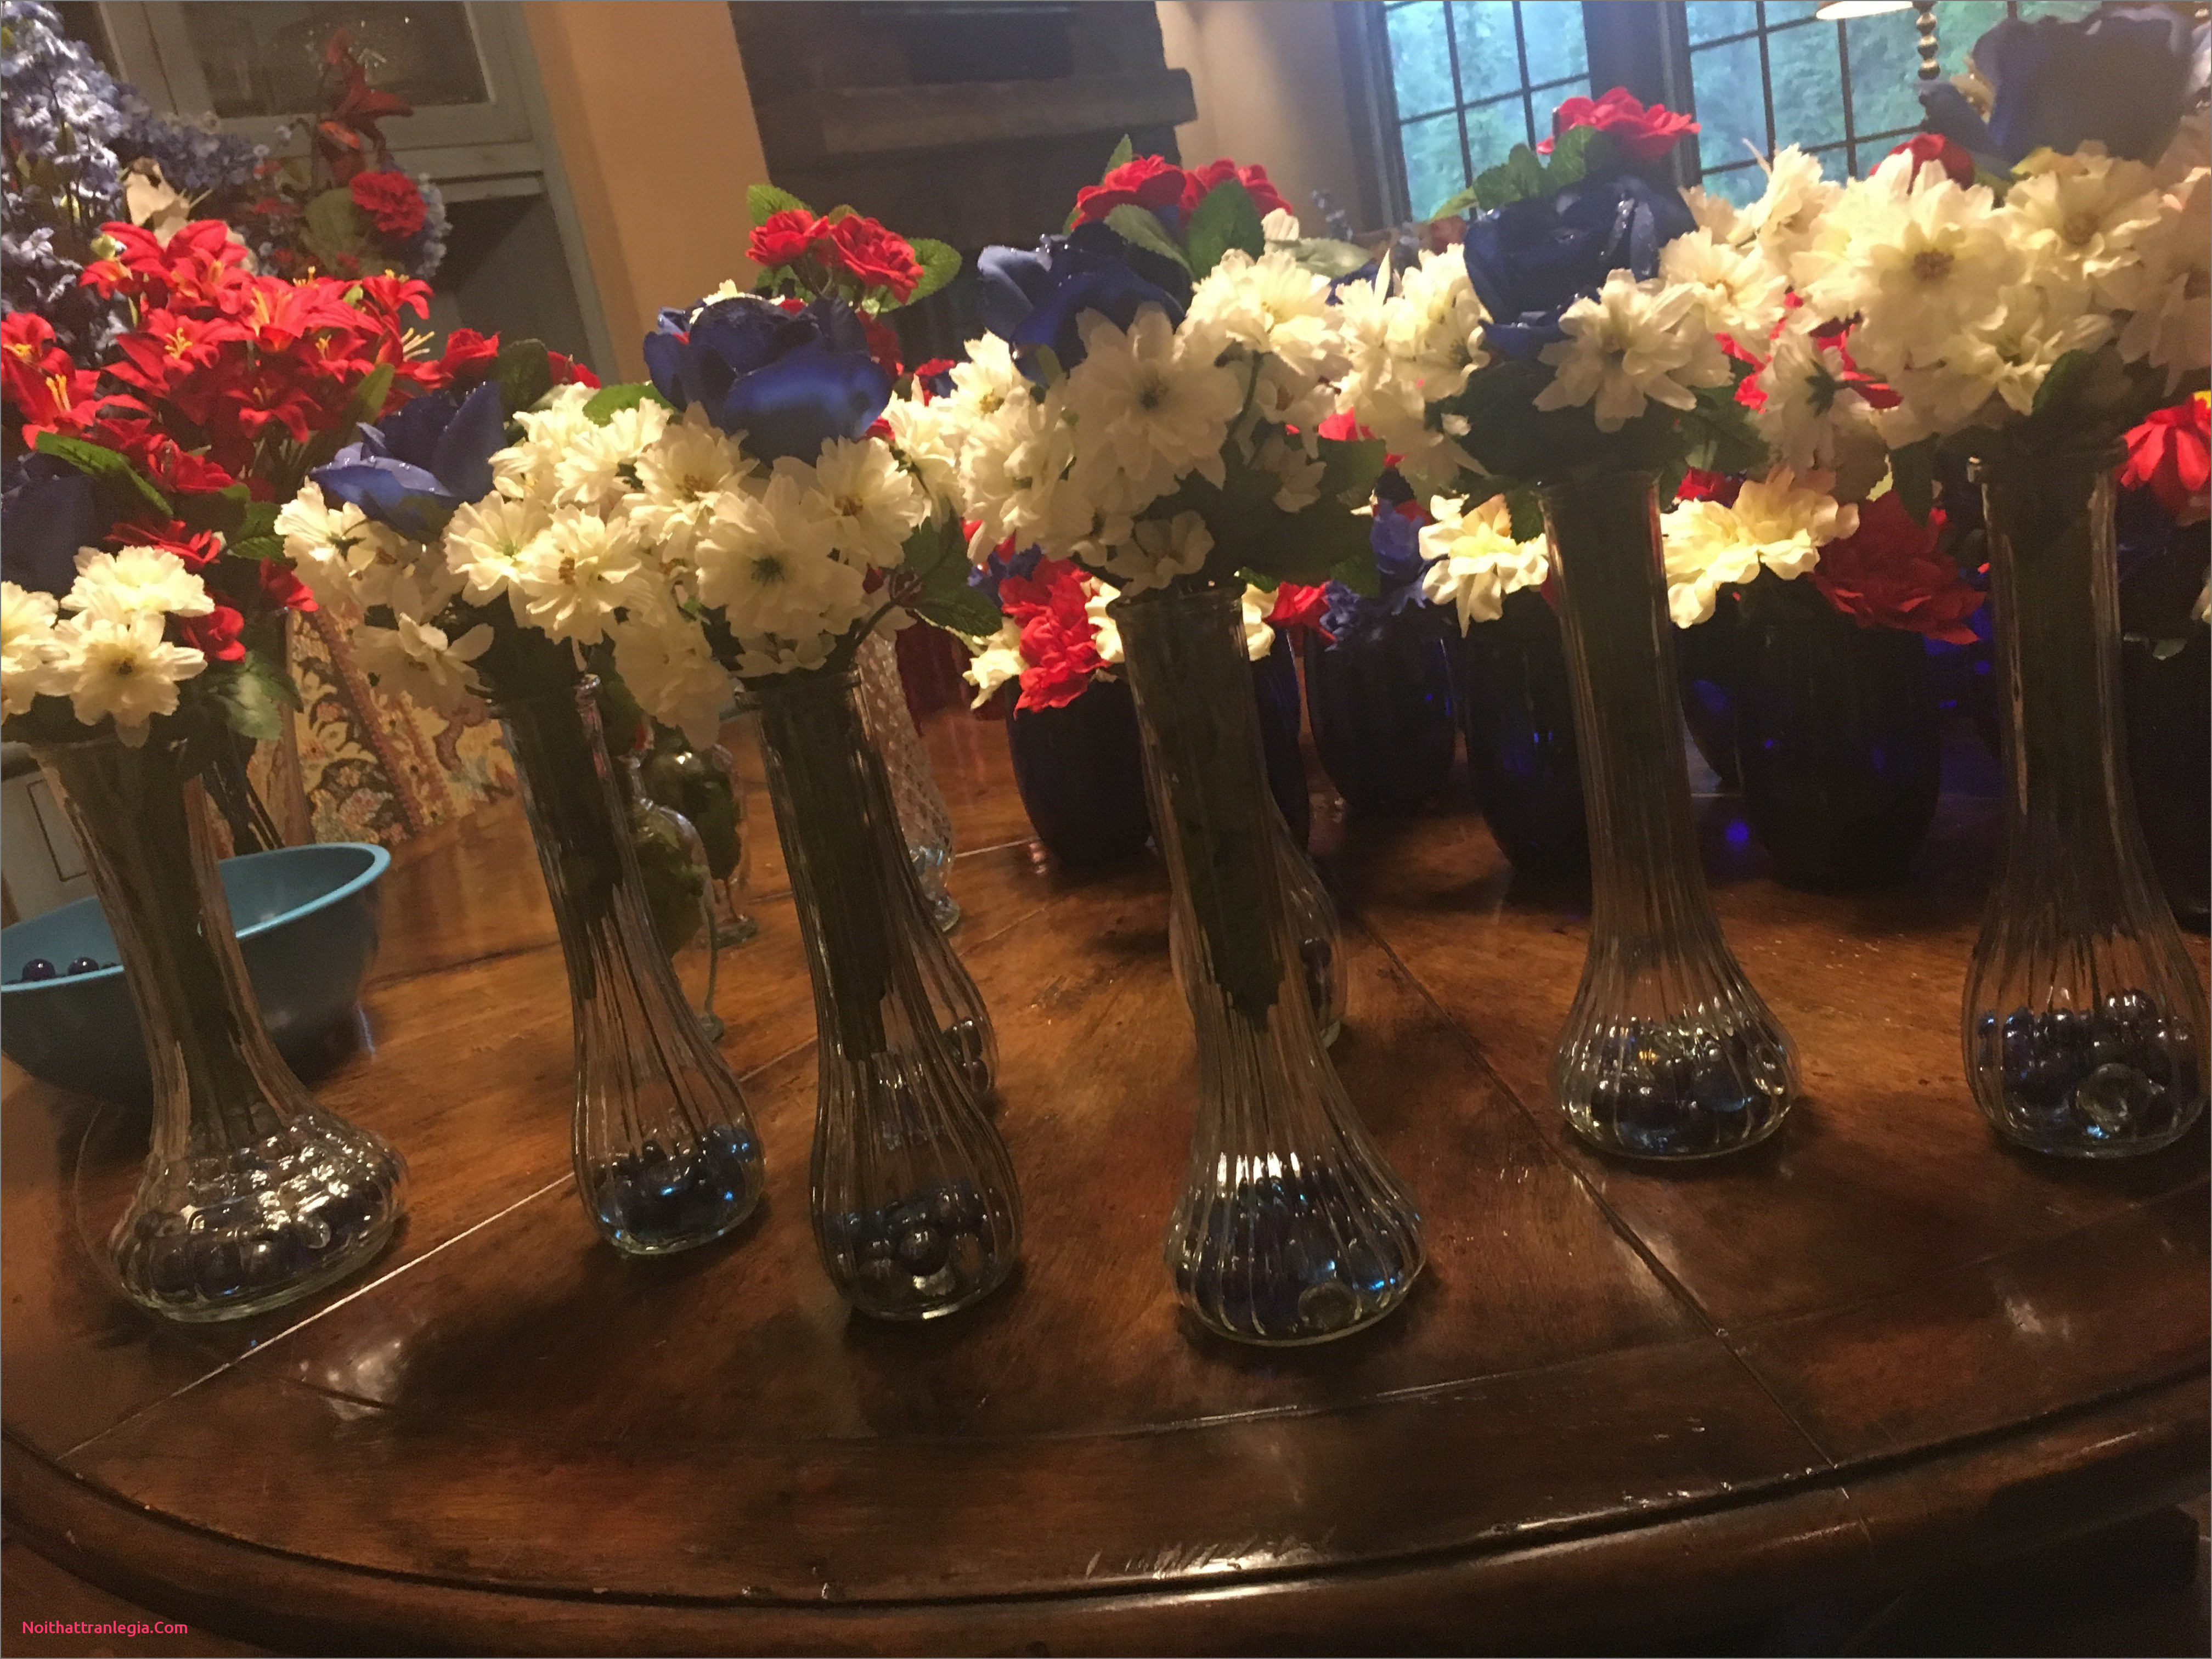 rectangle glass vase of 20 wedding vases noithattranlegia vases design in decoration line luxury dollar tree wedding decorations awesome h vases dollar vase i 0d